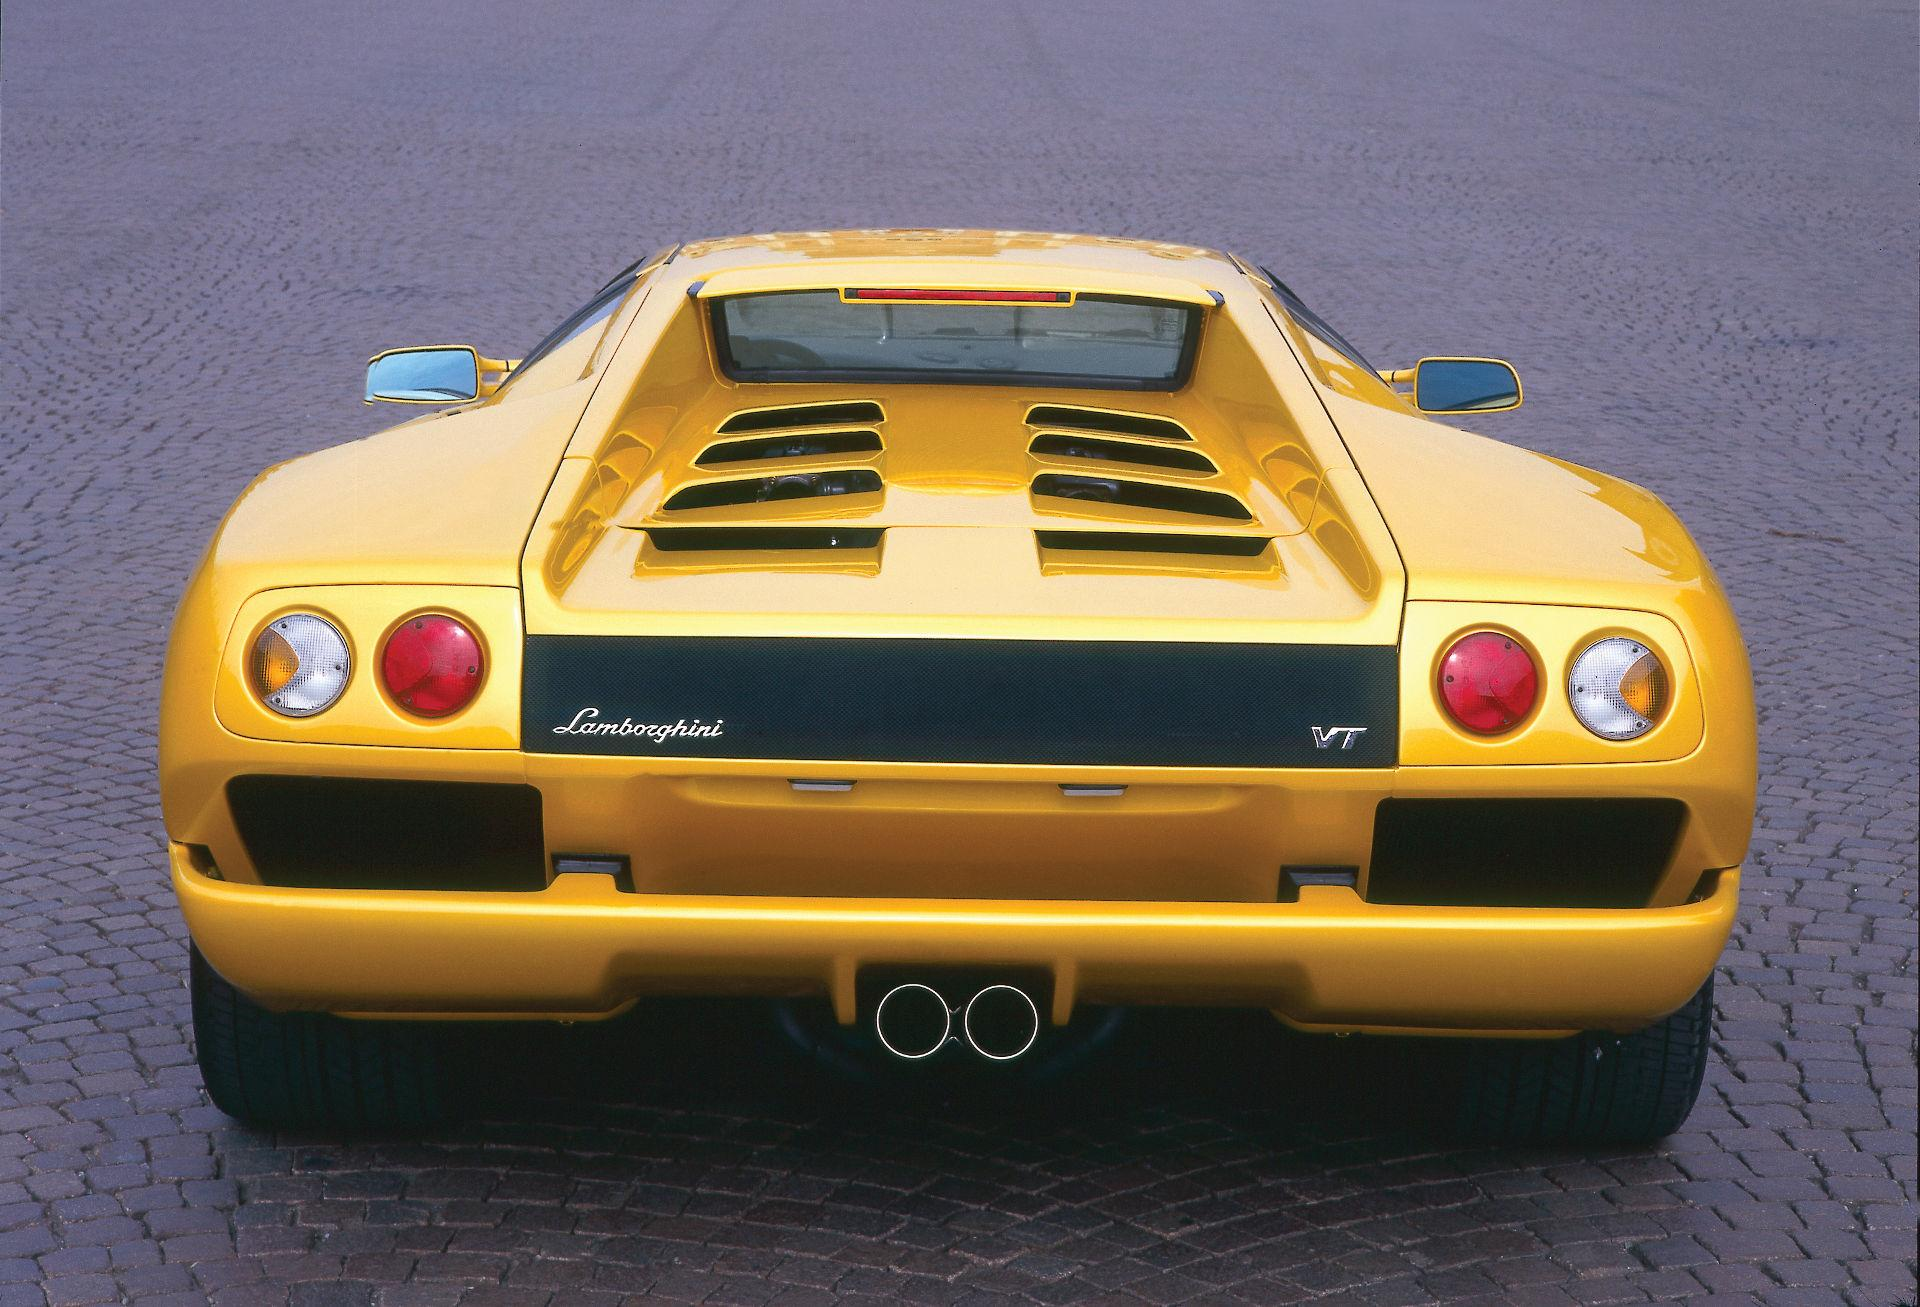 Ausfuhrliche Modellbeschreibung Uber Den Lamborghini Diablo